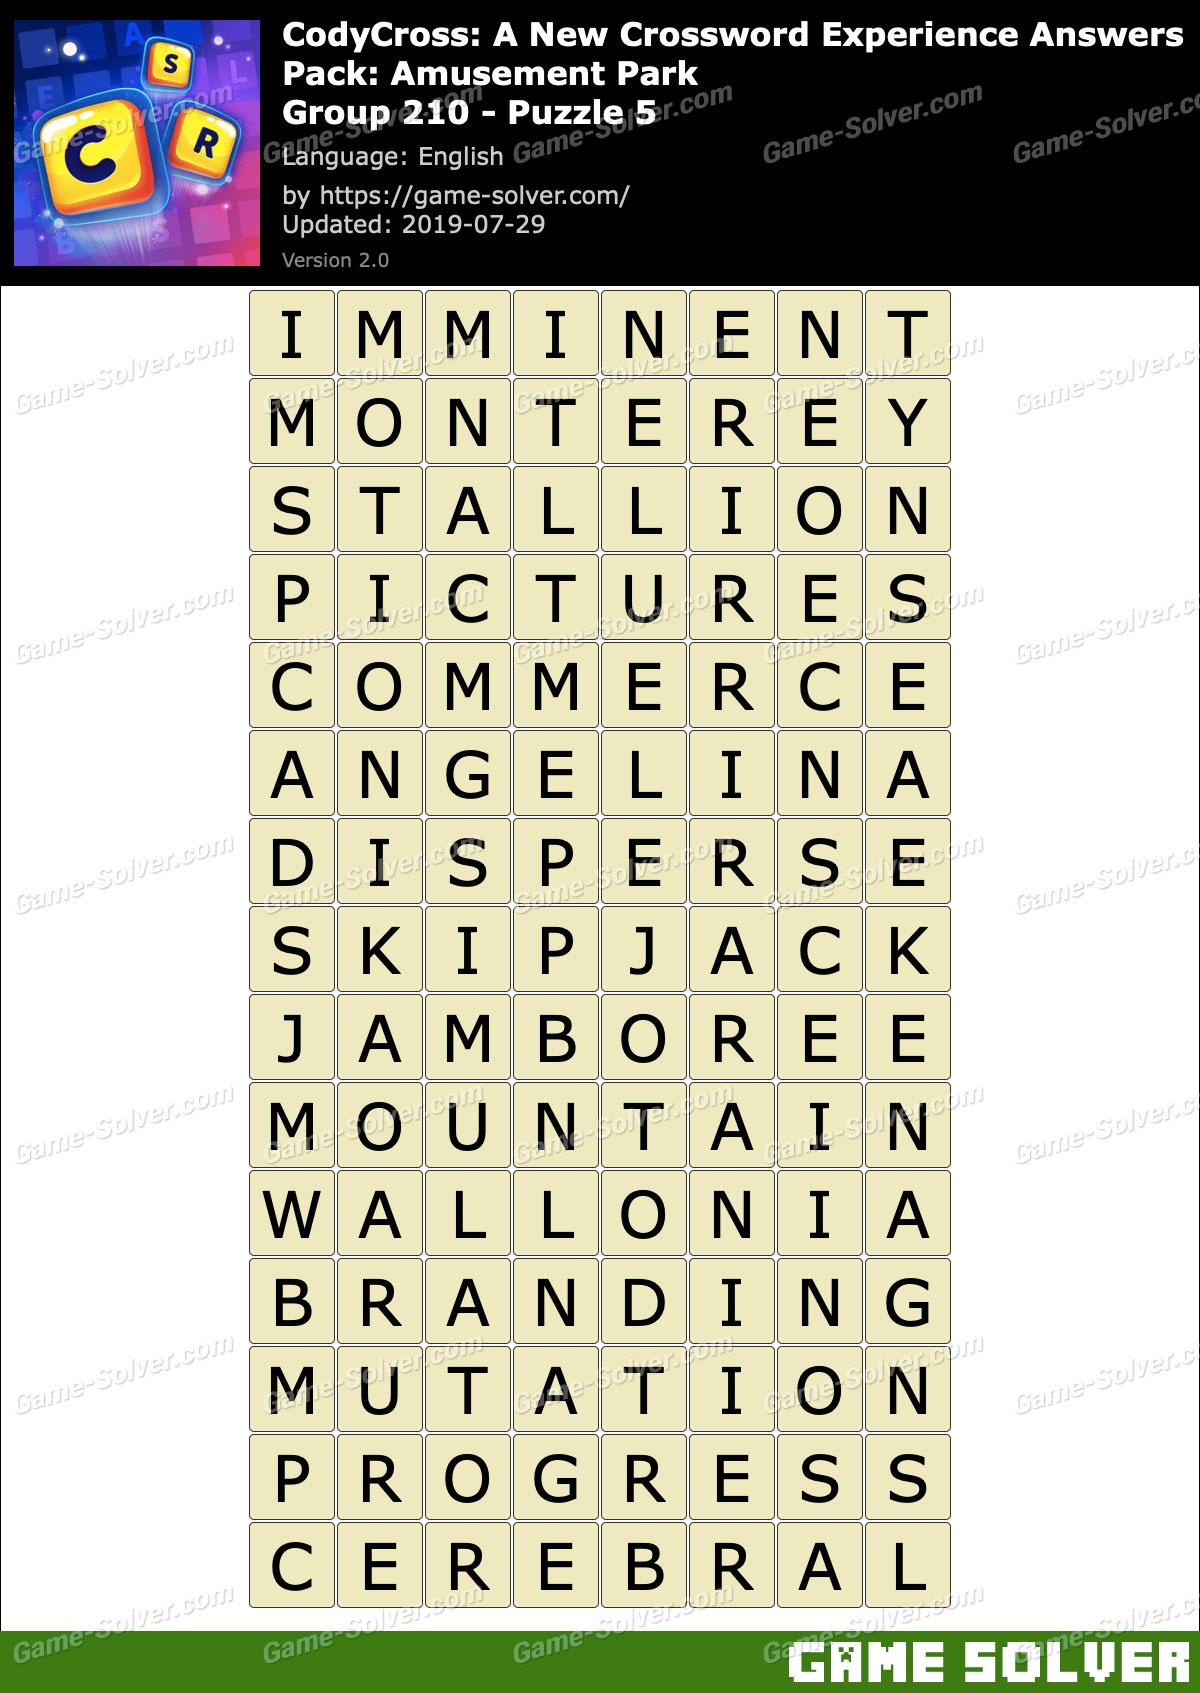 CodyCross Amusement Park Group 210-Puzzle 5 Answers